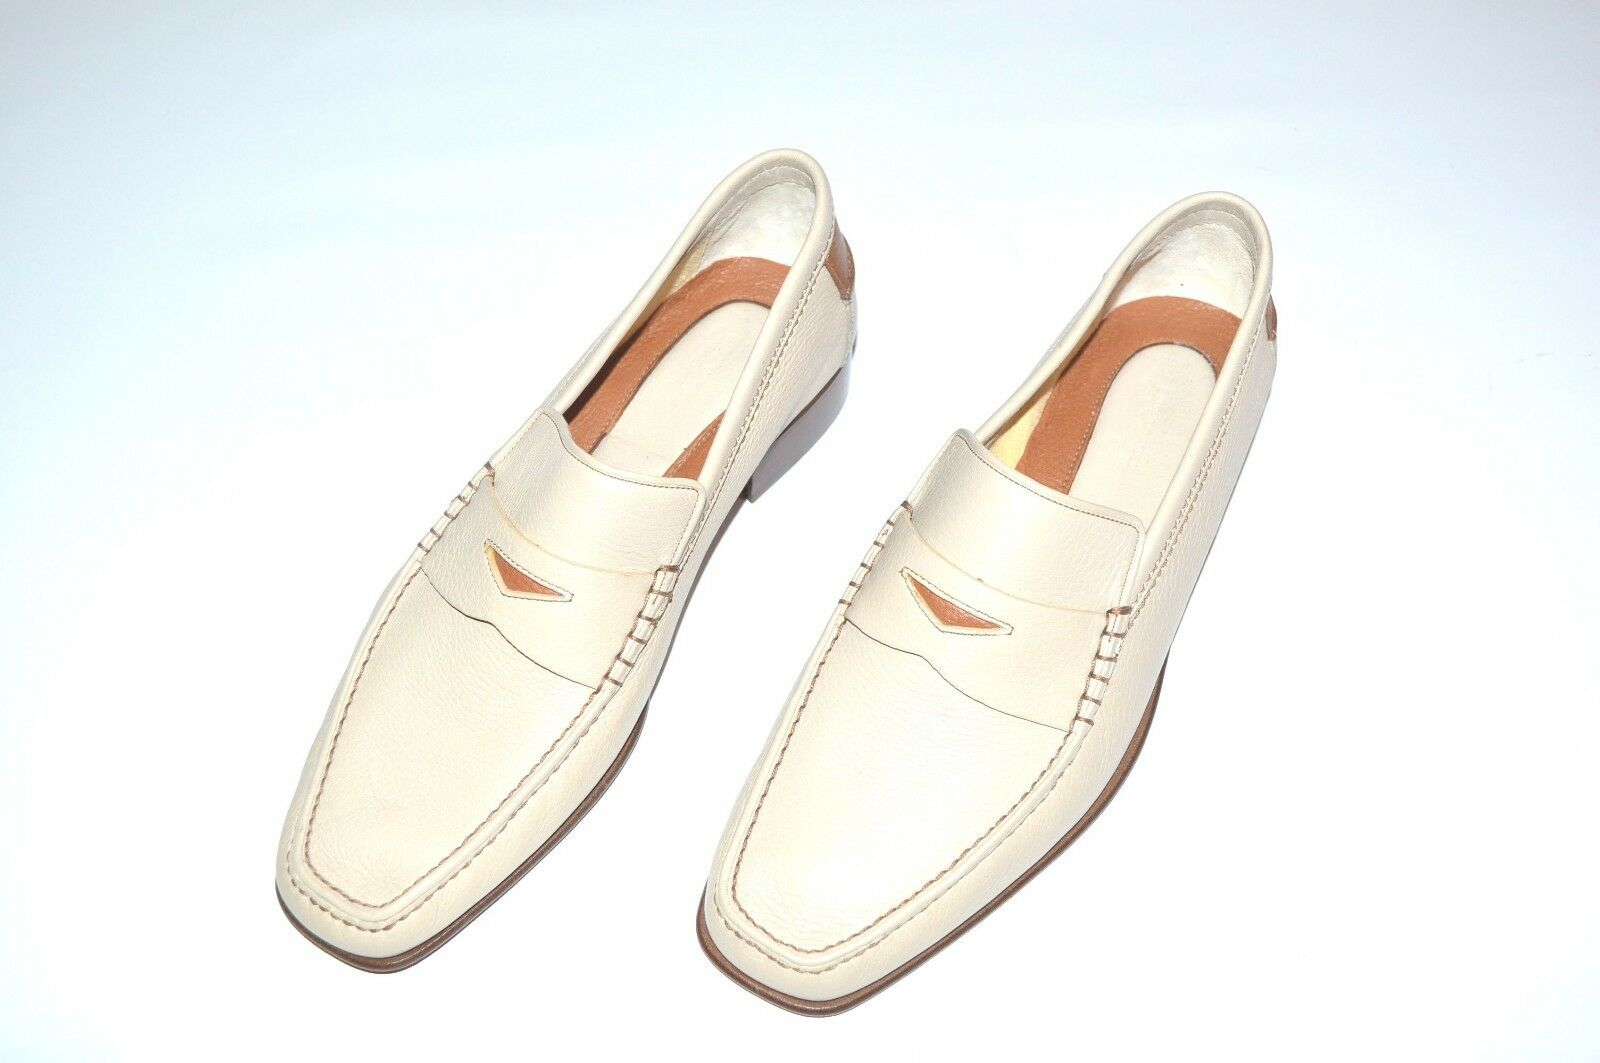 NEW  STEFANO RICCI Leather Shoes Size Eu 42 Us 9 (Cod 451)